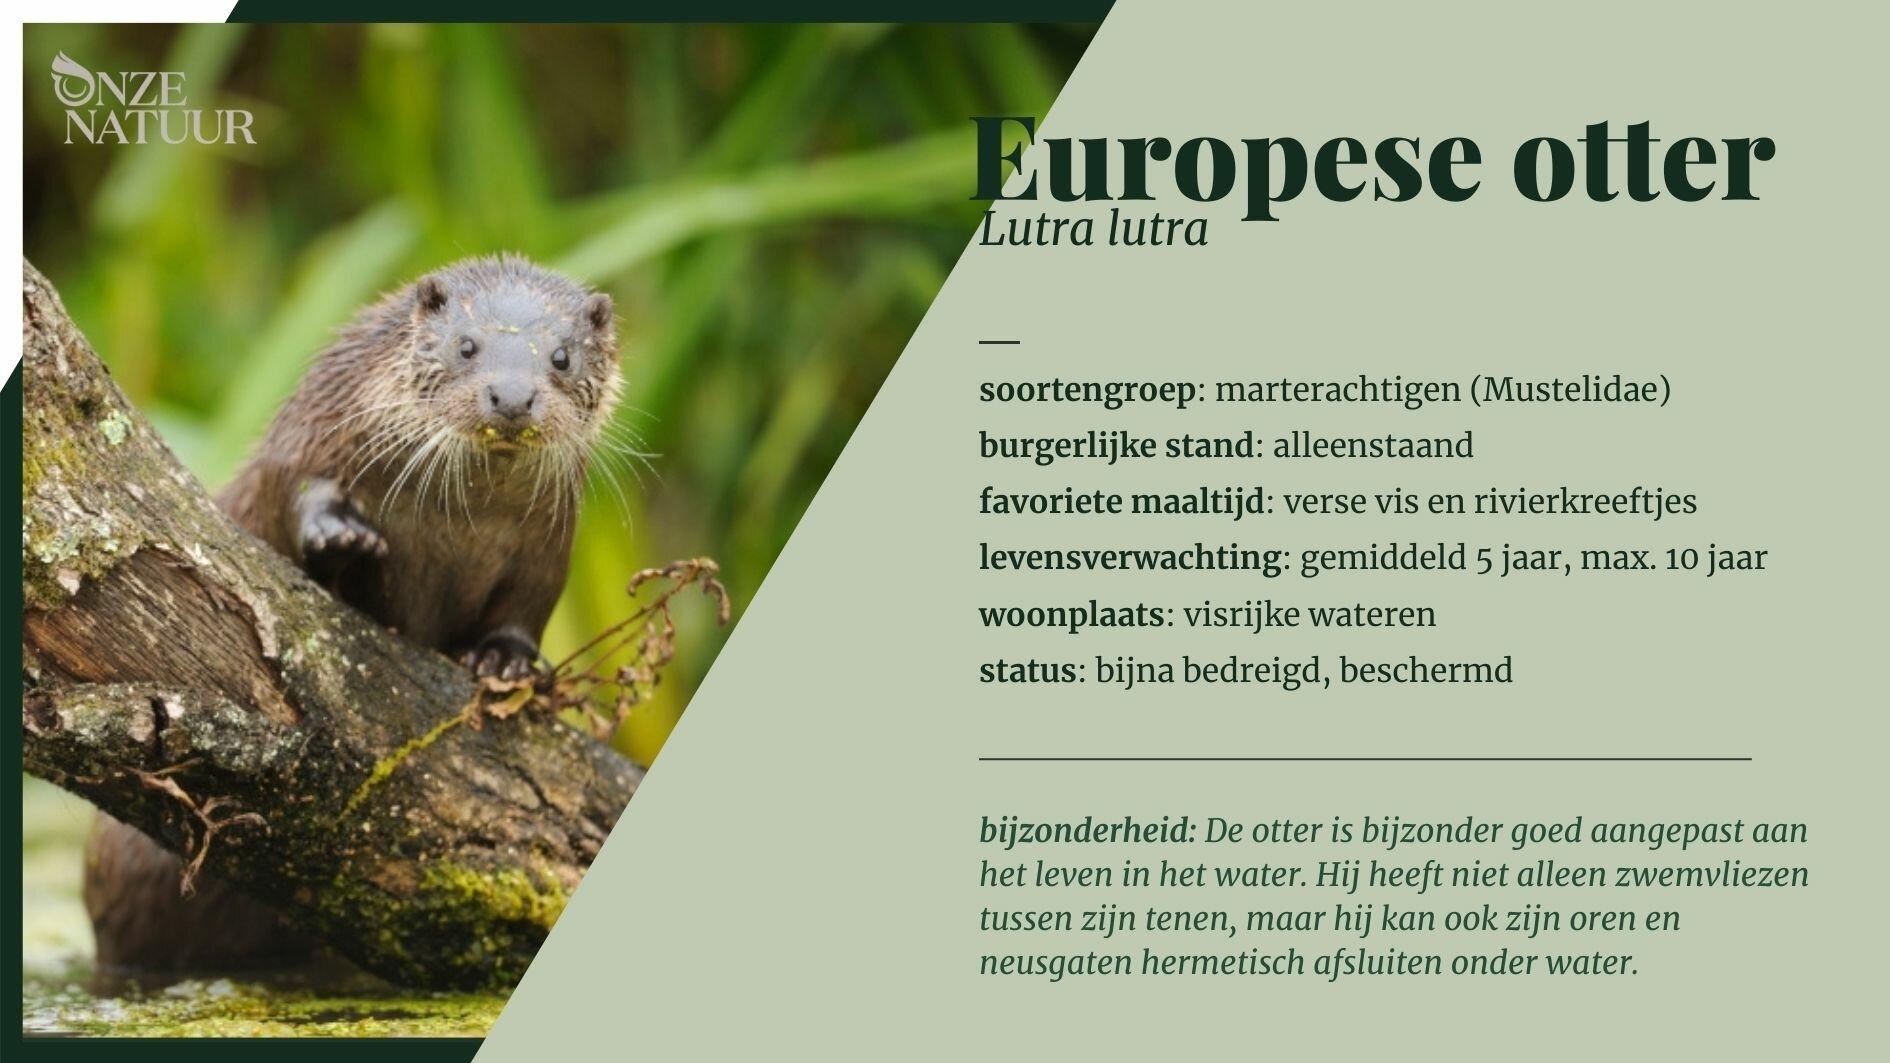 kopie-van-gewone-zeehond-nl.jpg